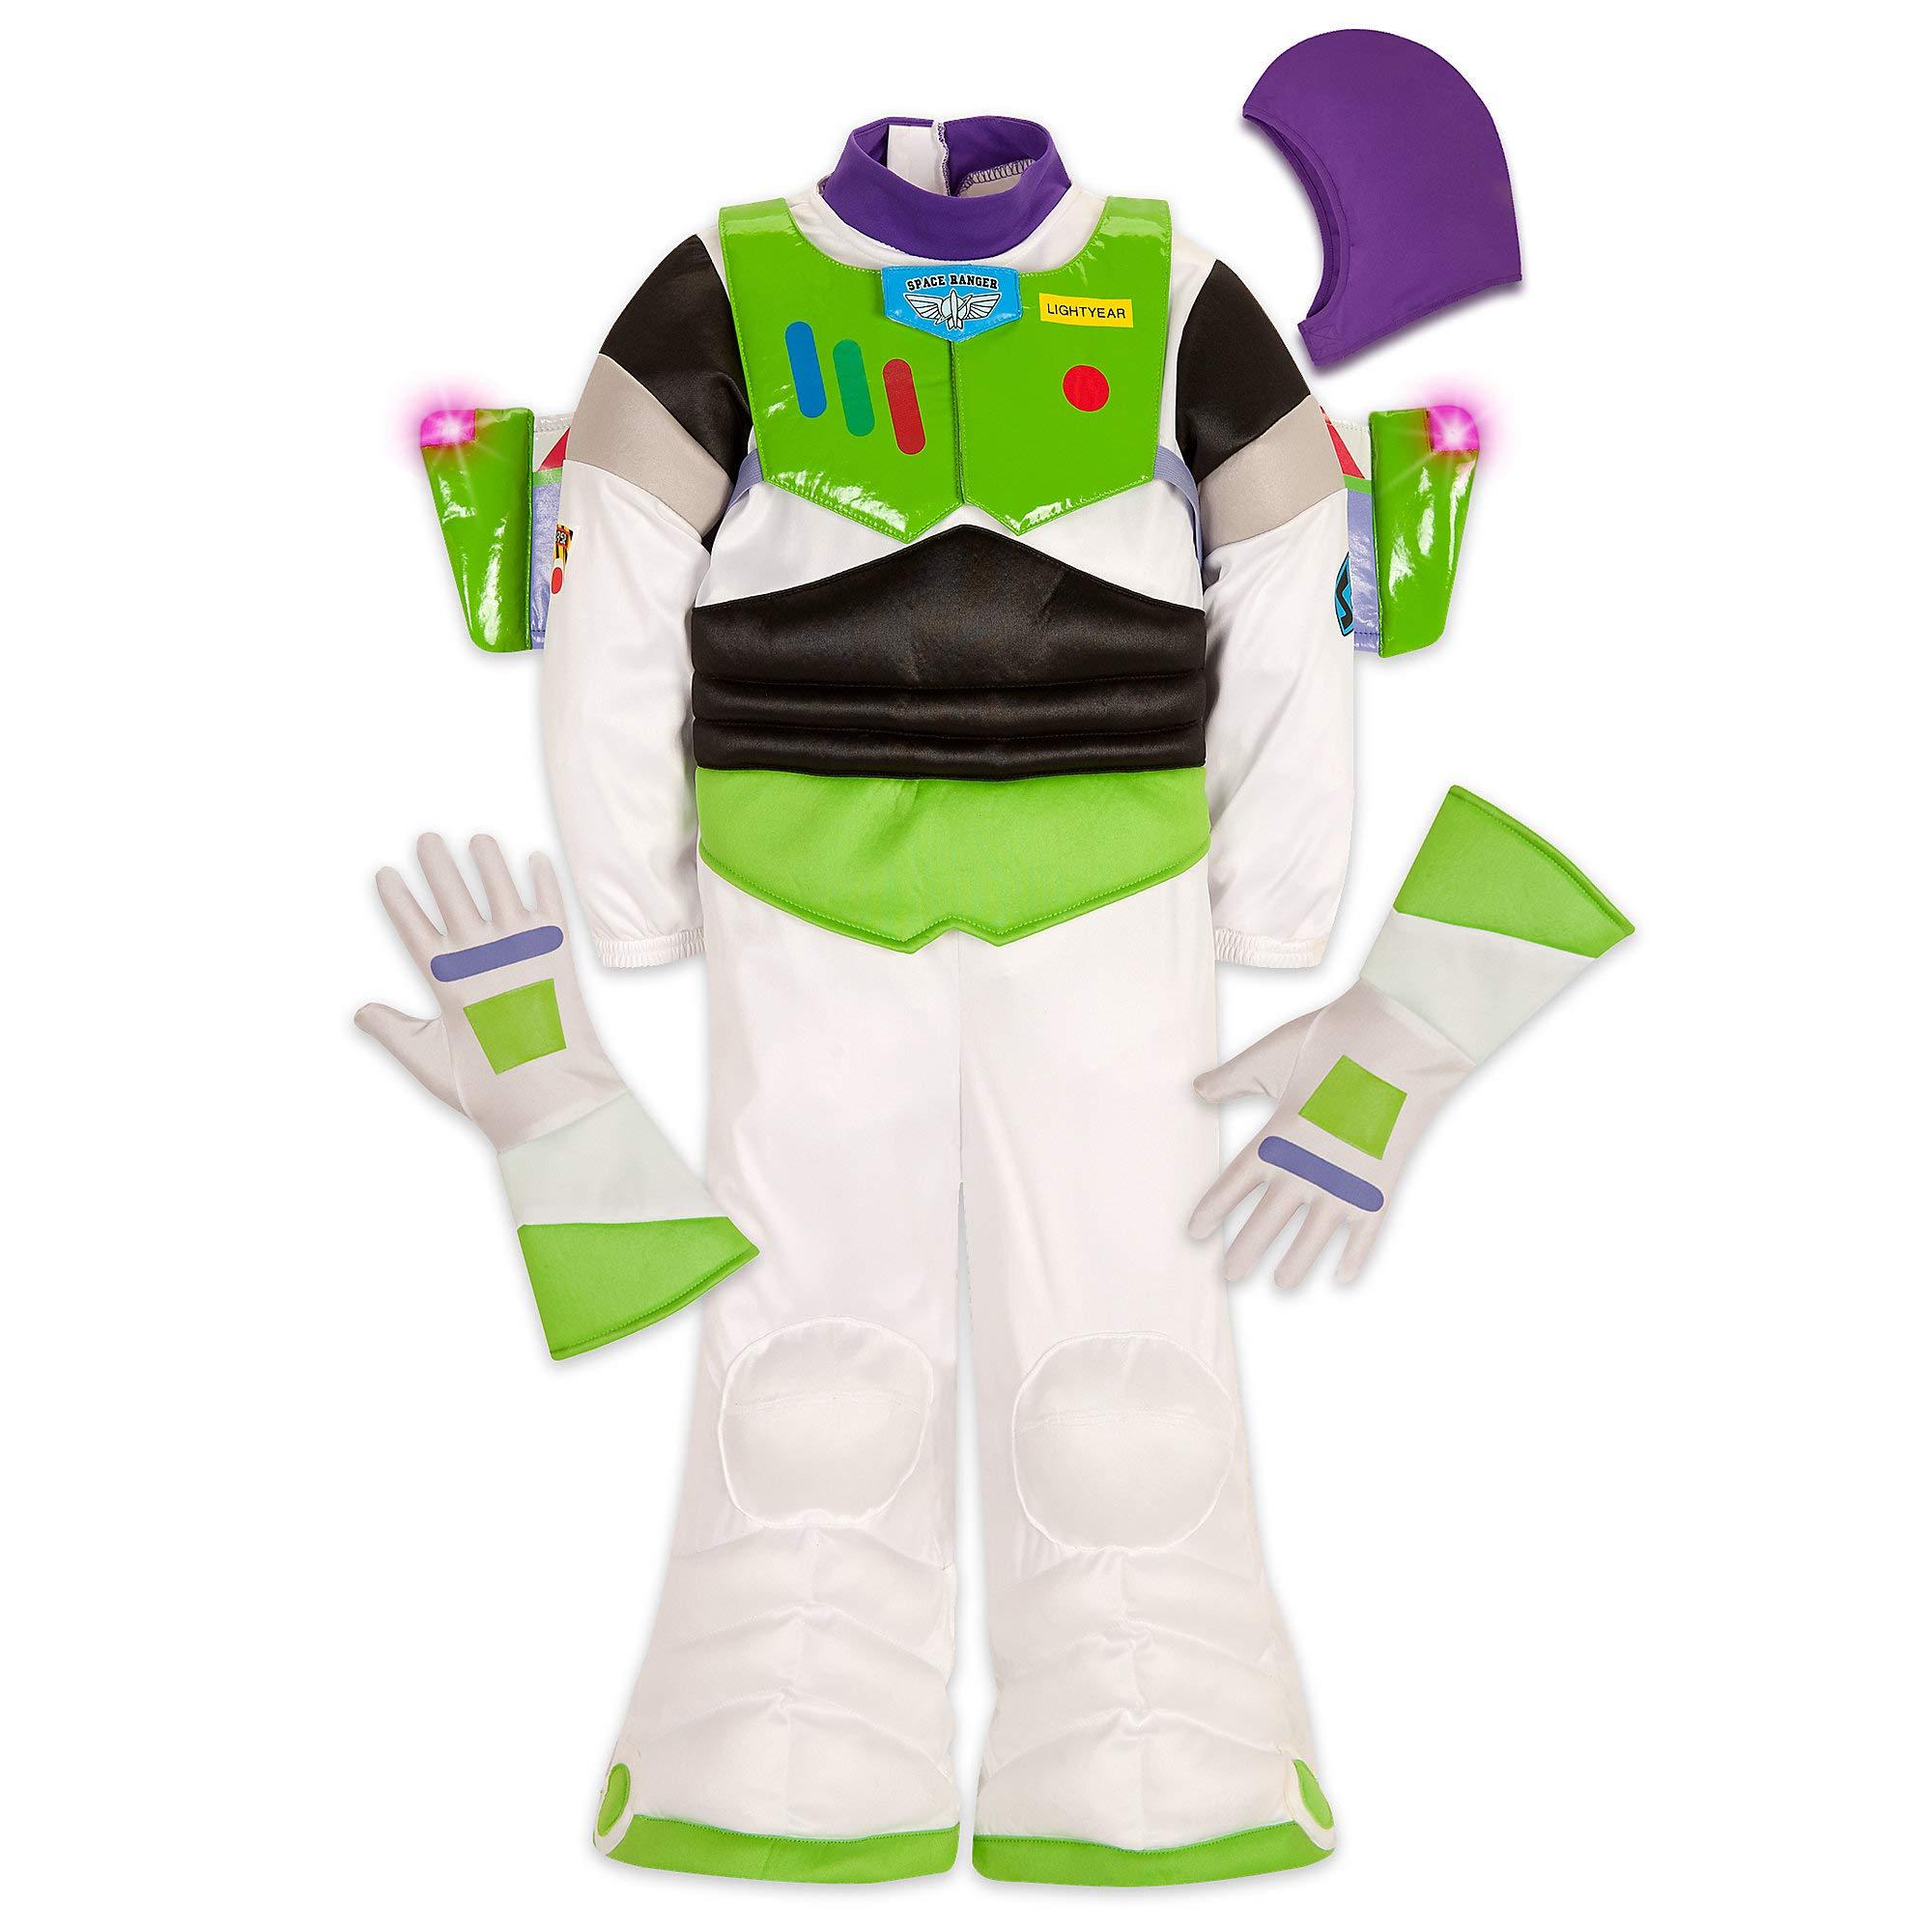 Disney Buzz Lightyear Light-Up Costume for Kids Size 4 White by Disney Pixar (Image #1)